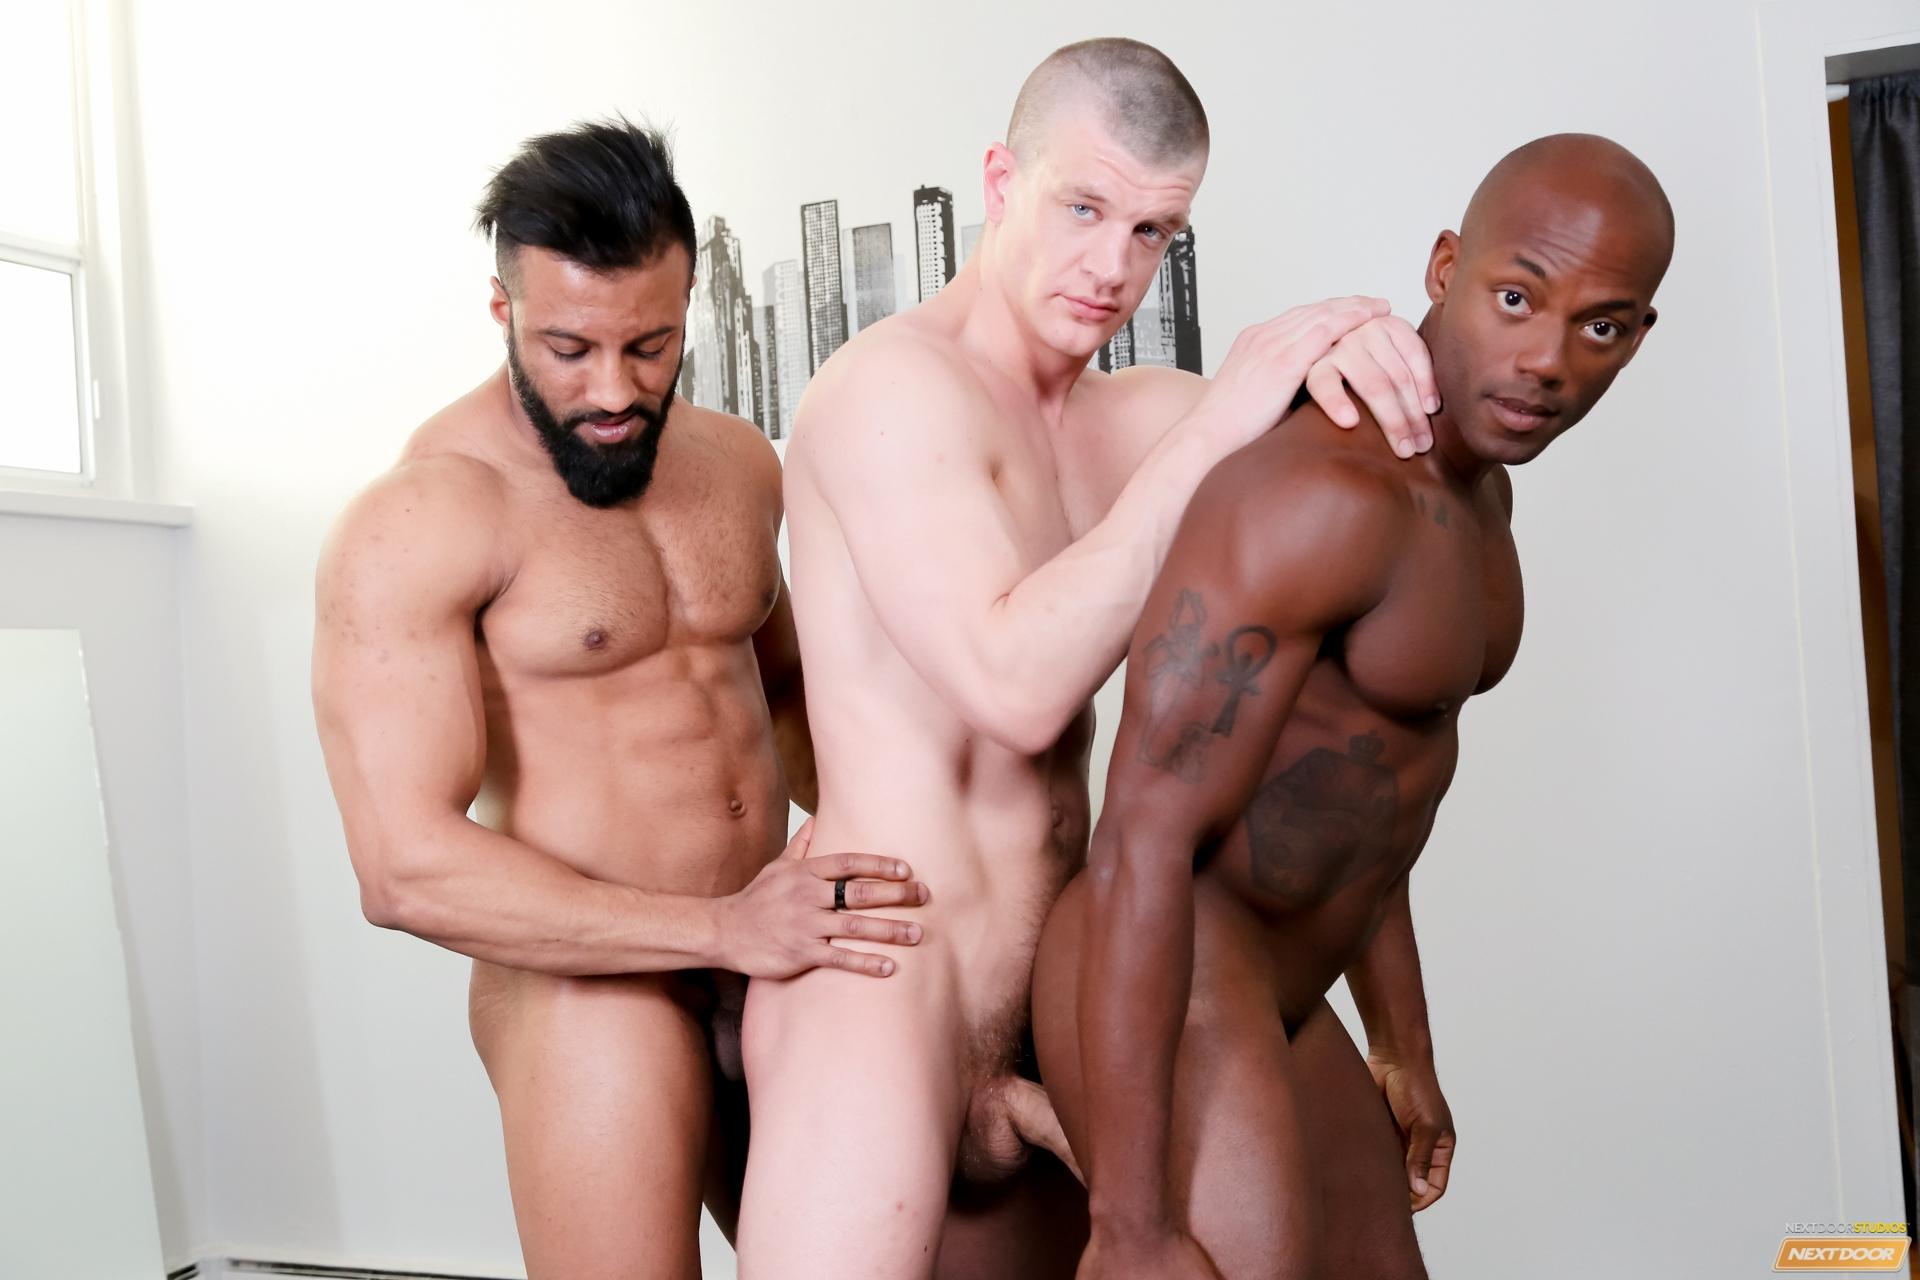 Gay porn tube nipples